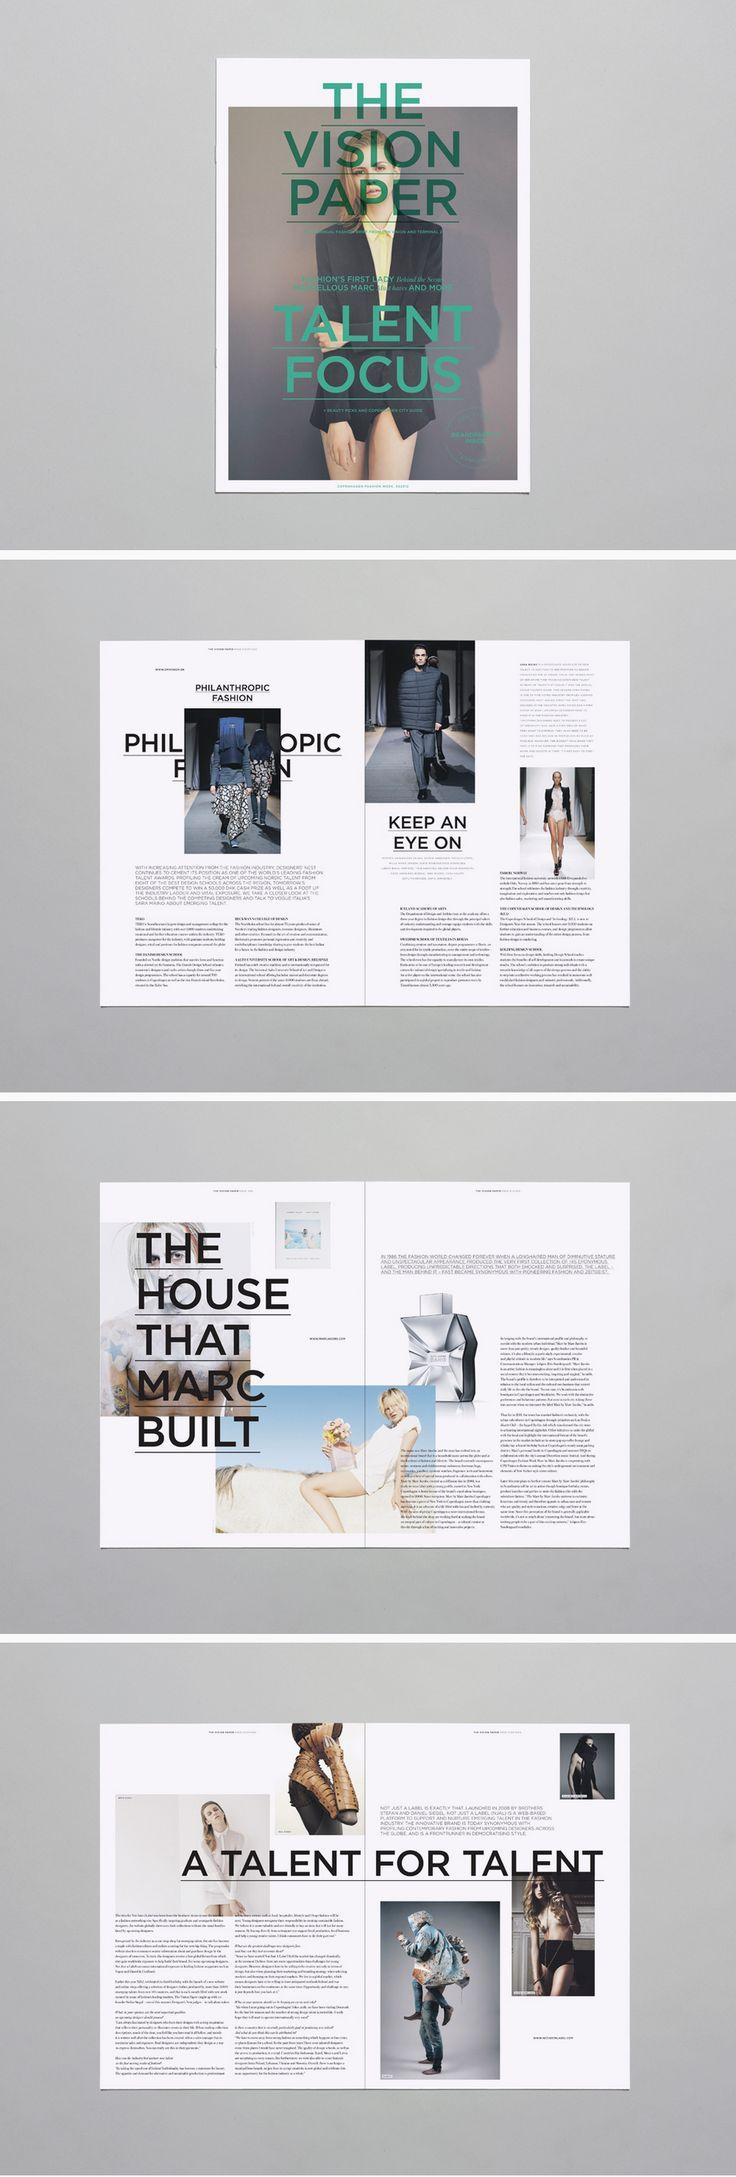 Mark Brunswicker's work on The Vision Paper #layout #magazine #design